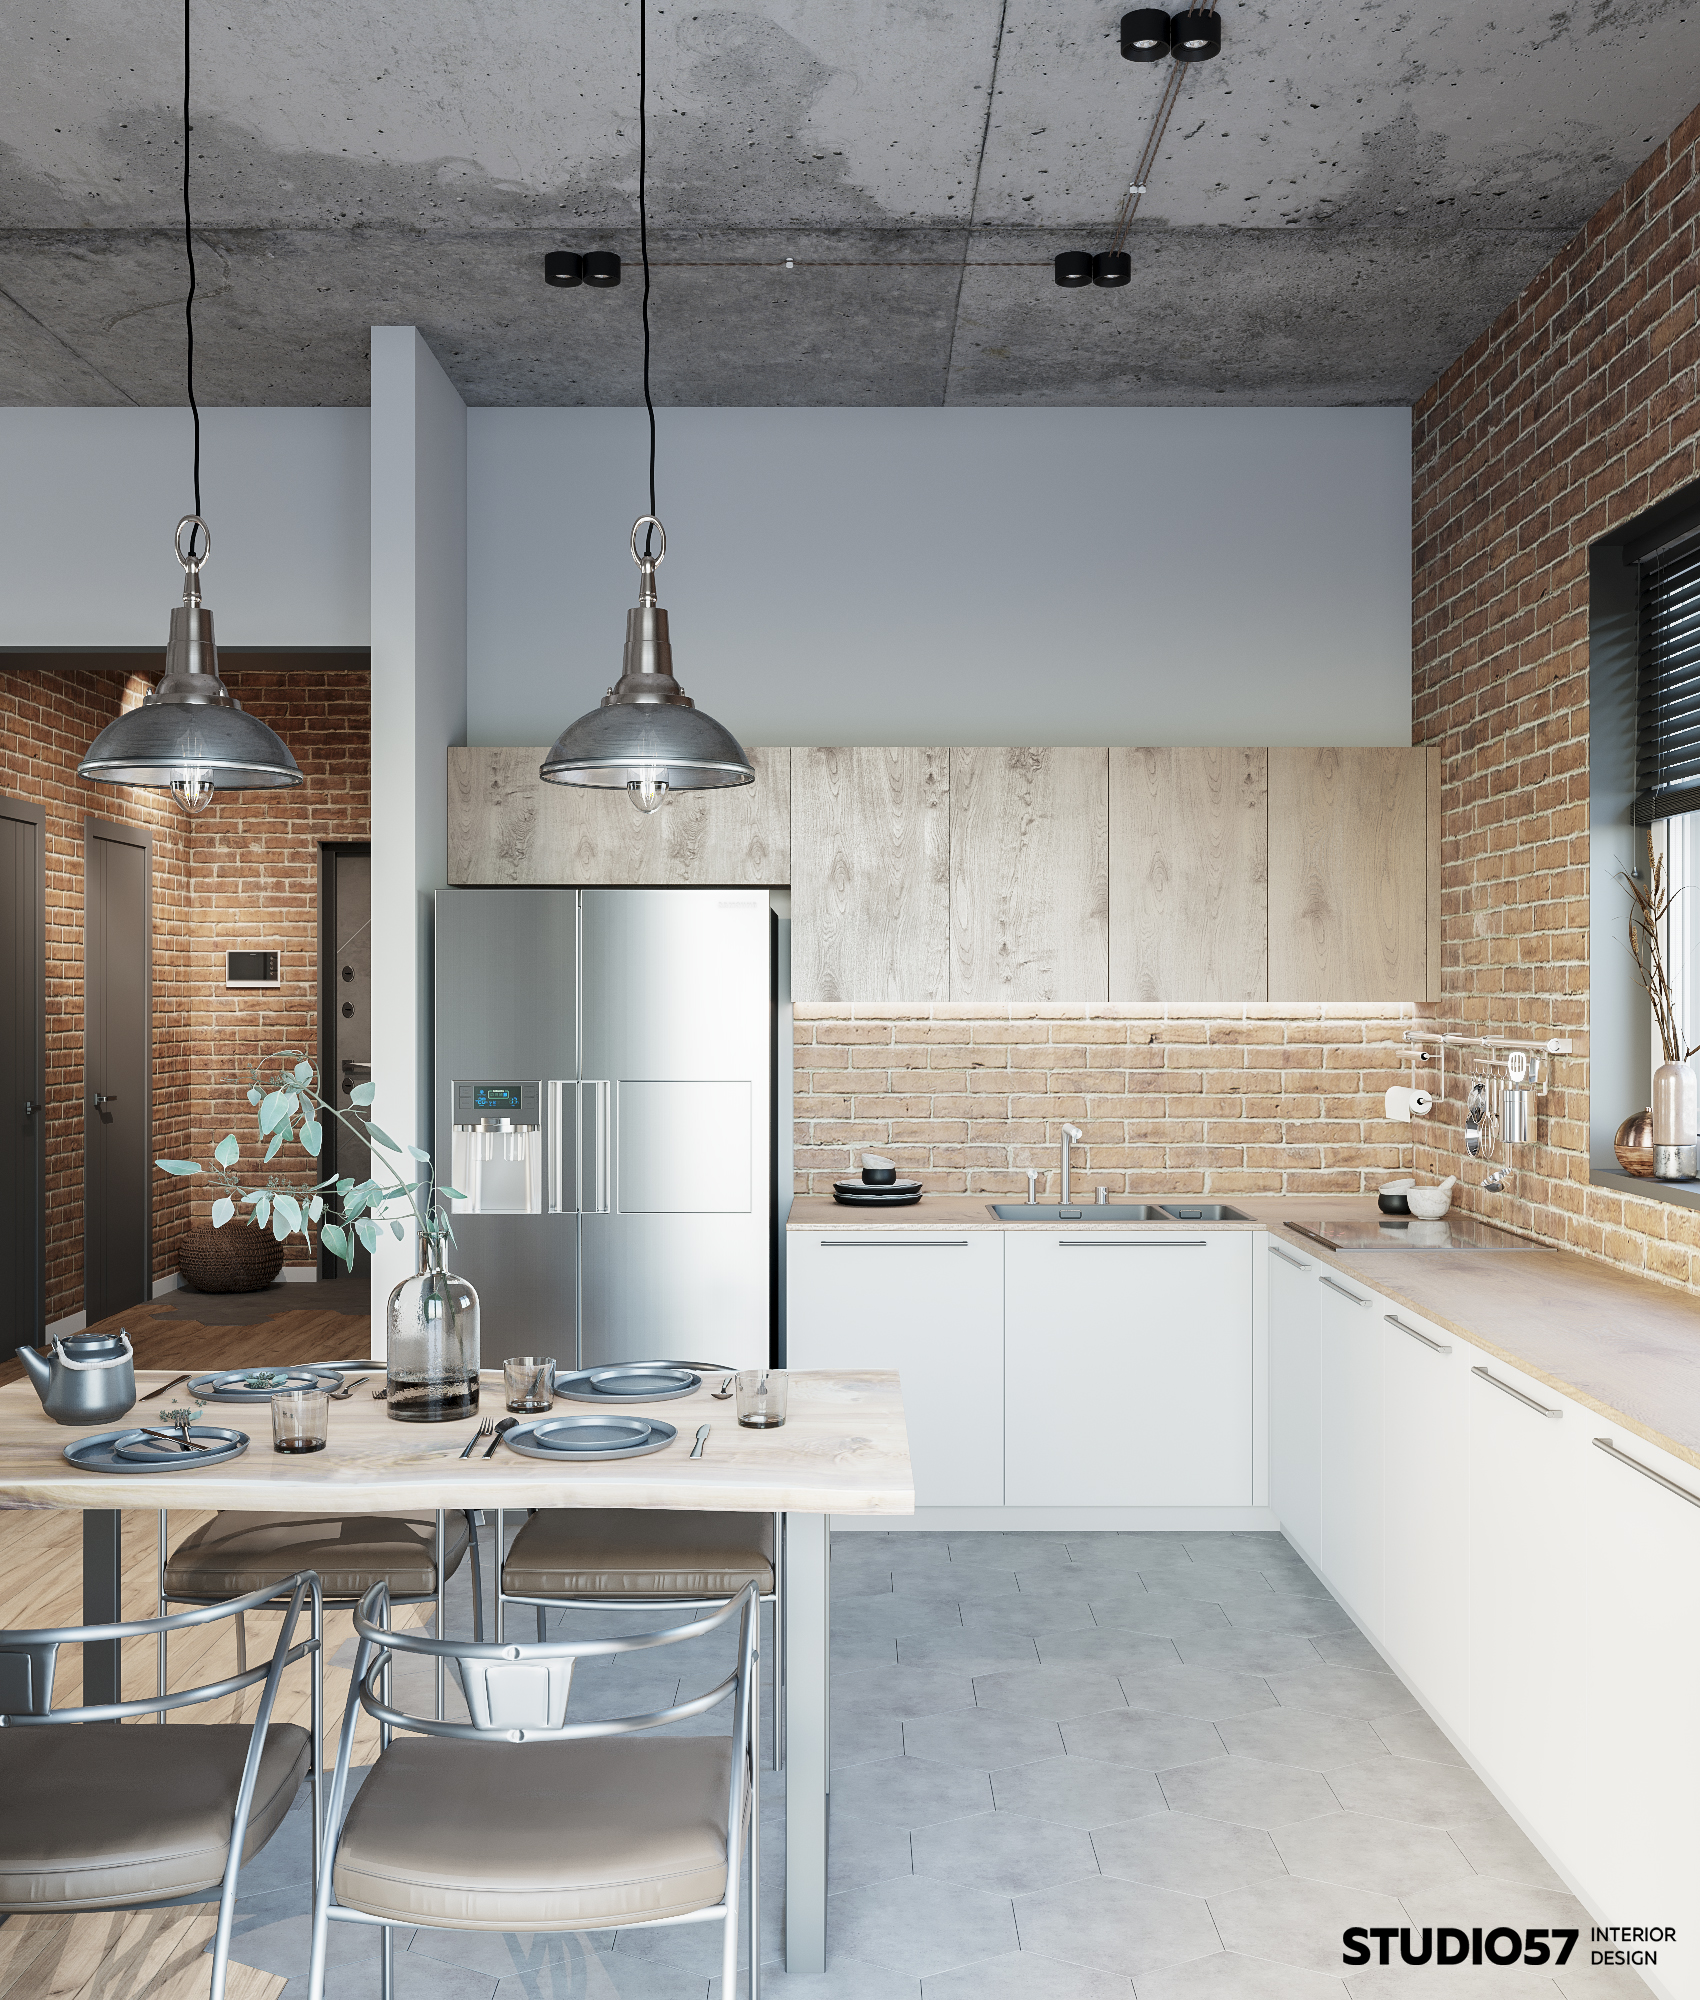 Интерьер кухни. Вид 2.